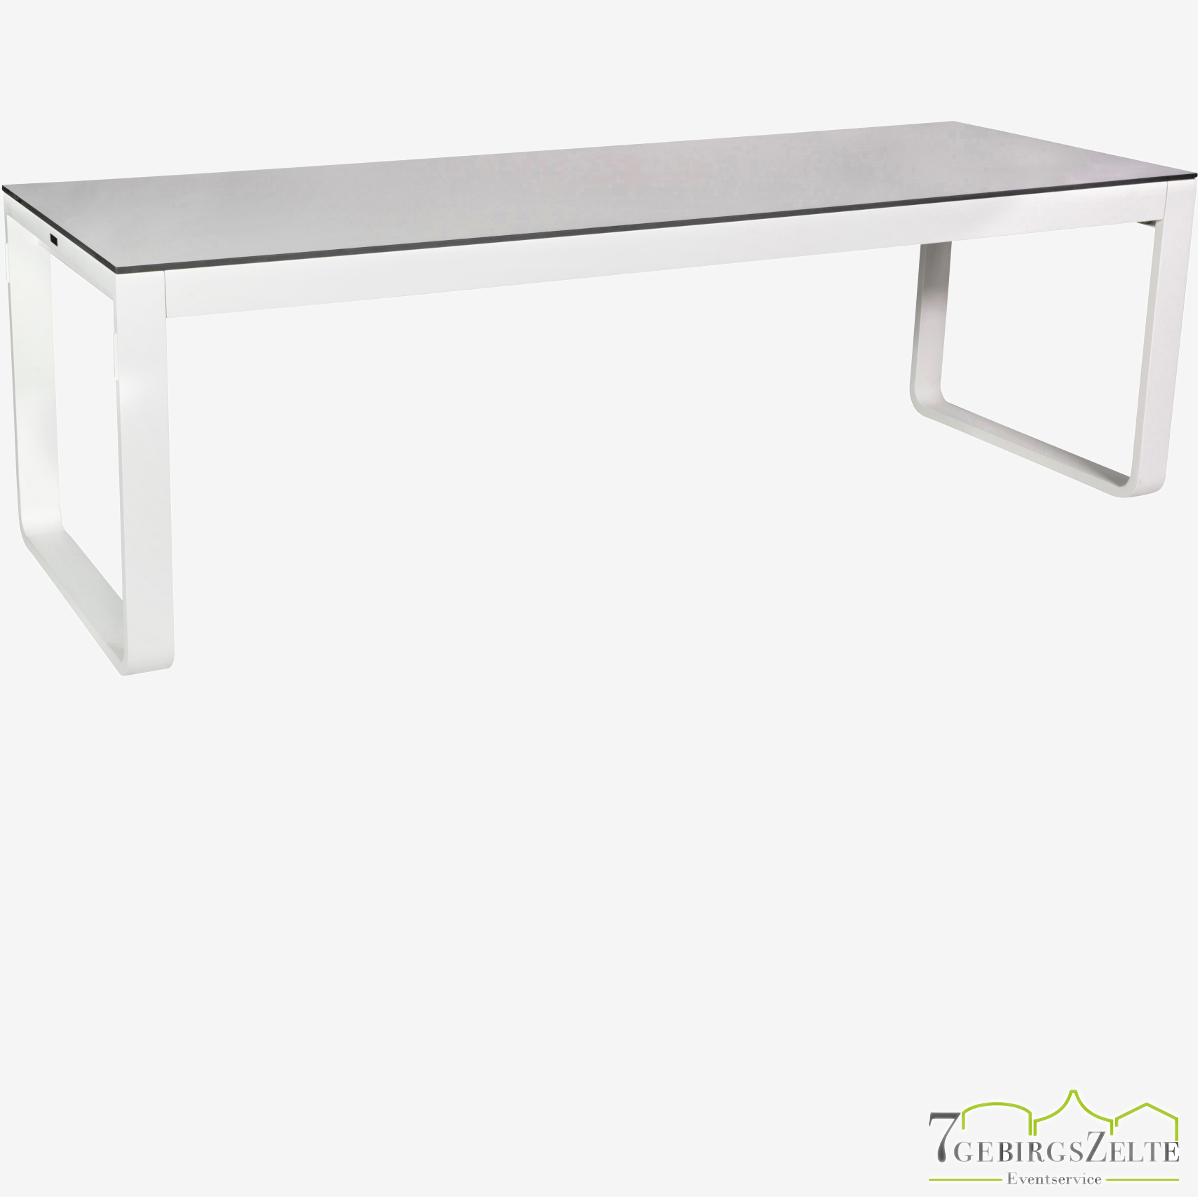 Flow Dinner 230x80x74cm alu weiß - top compact weiß